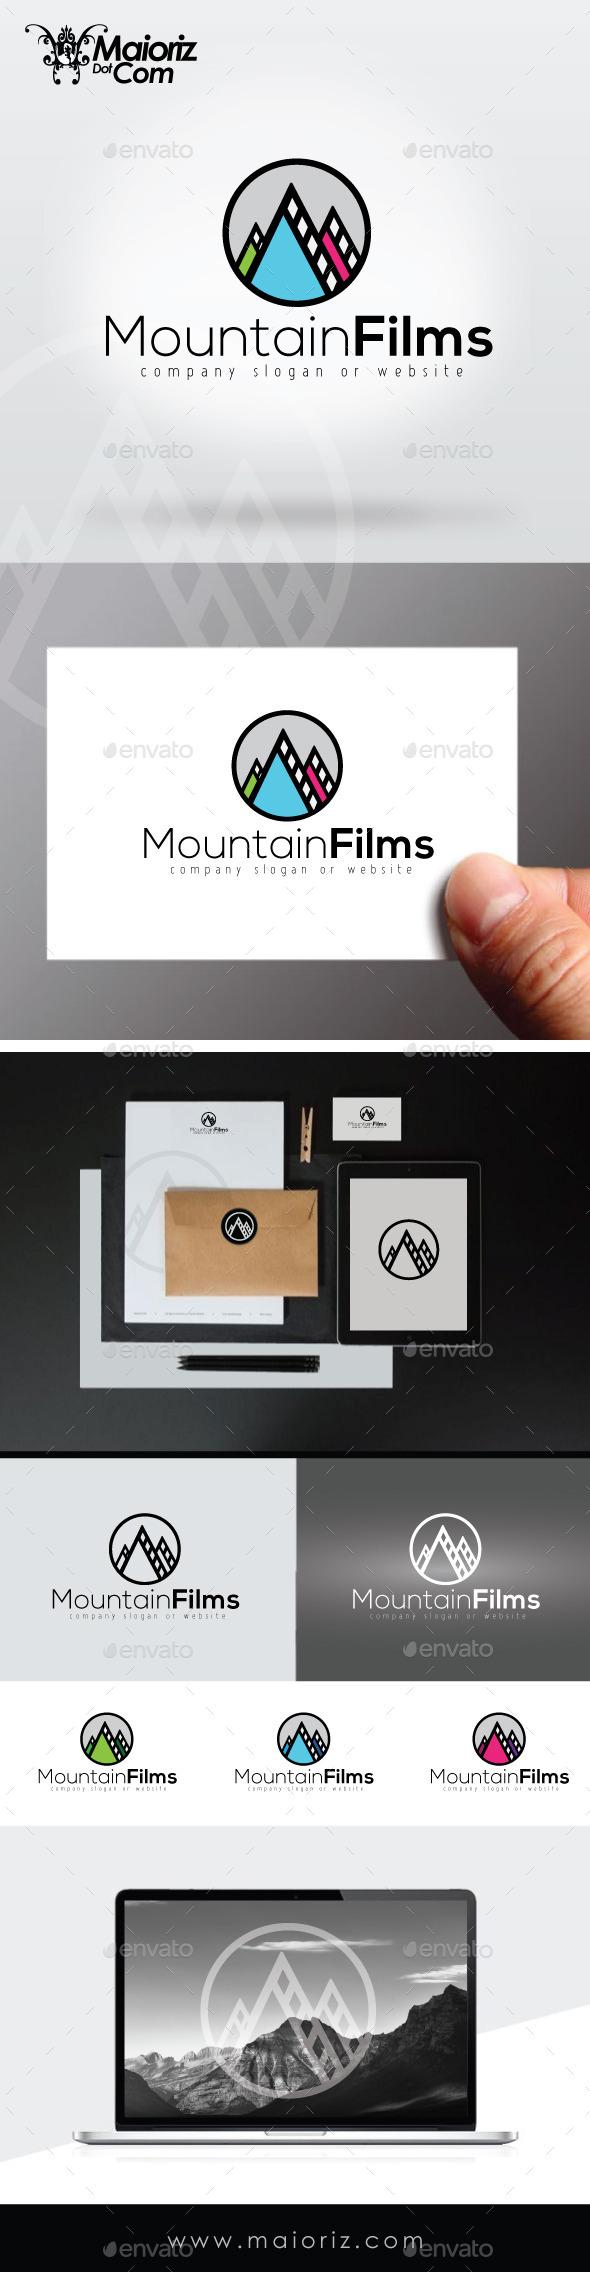 Mountain Films Logo Template